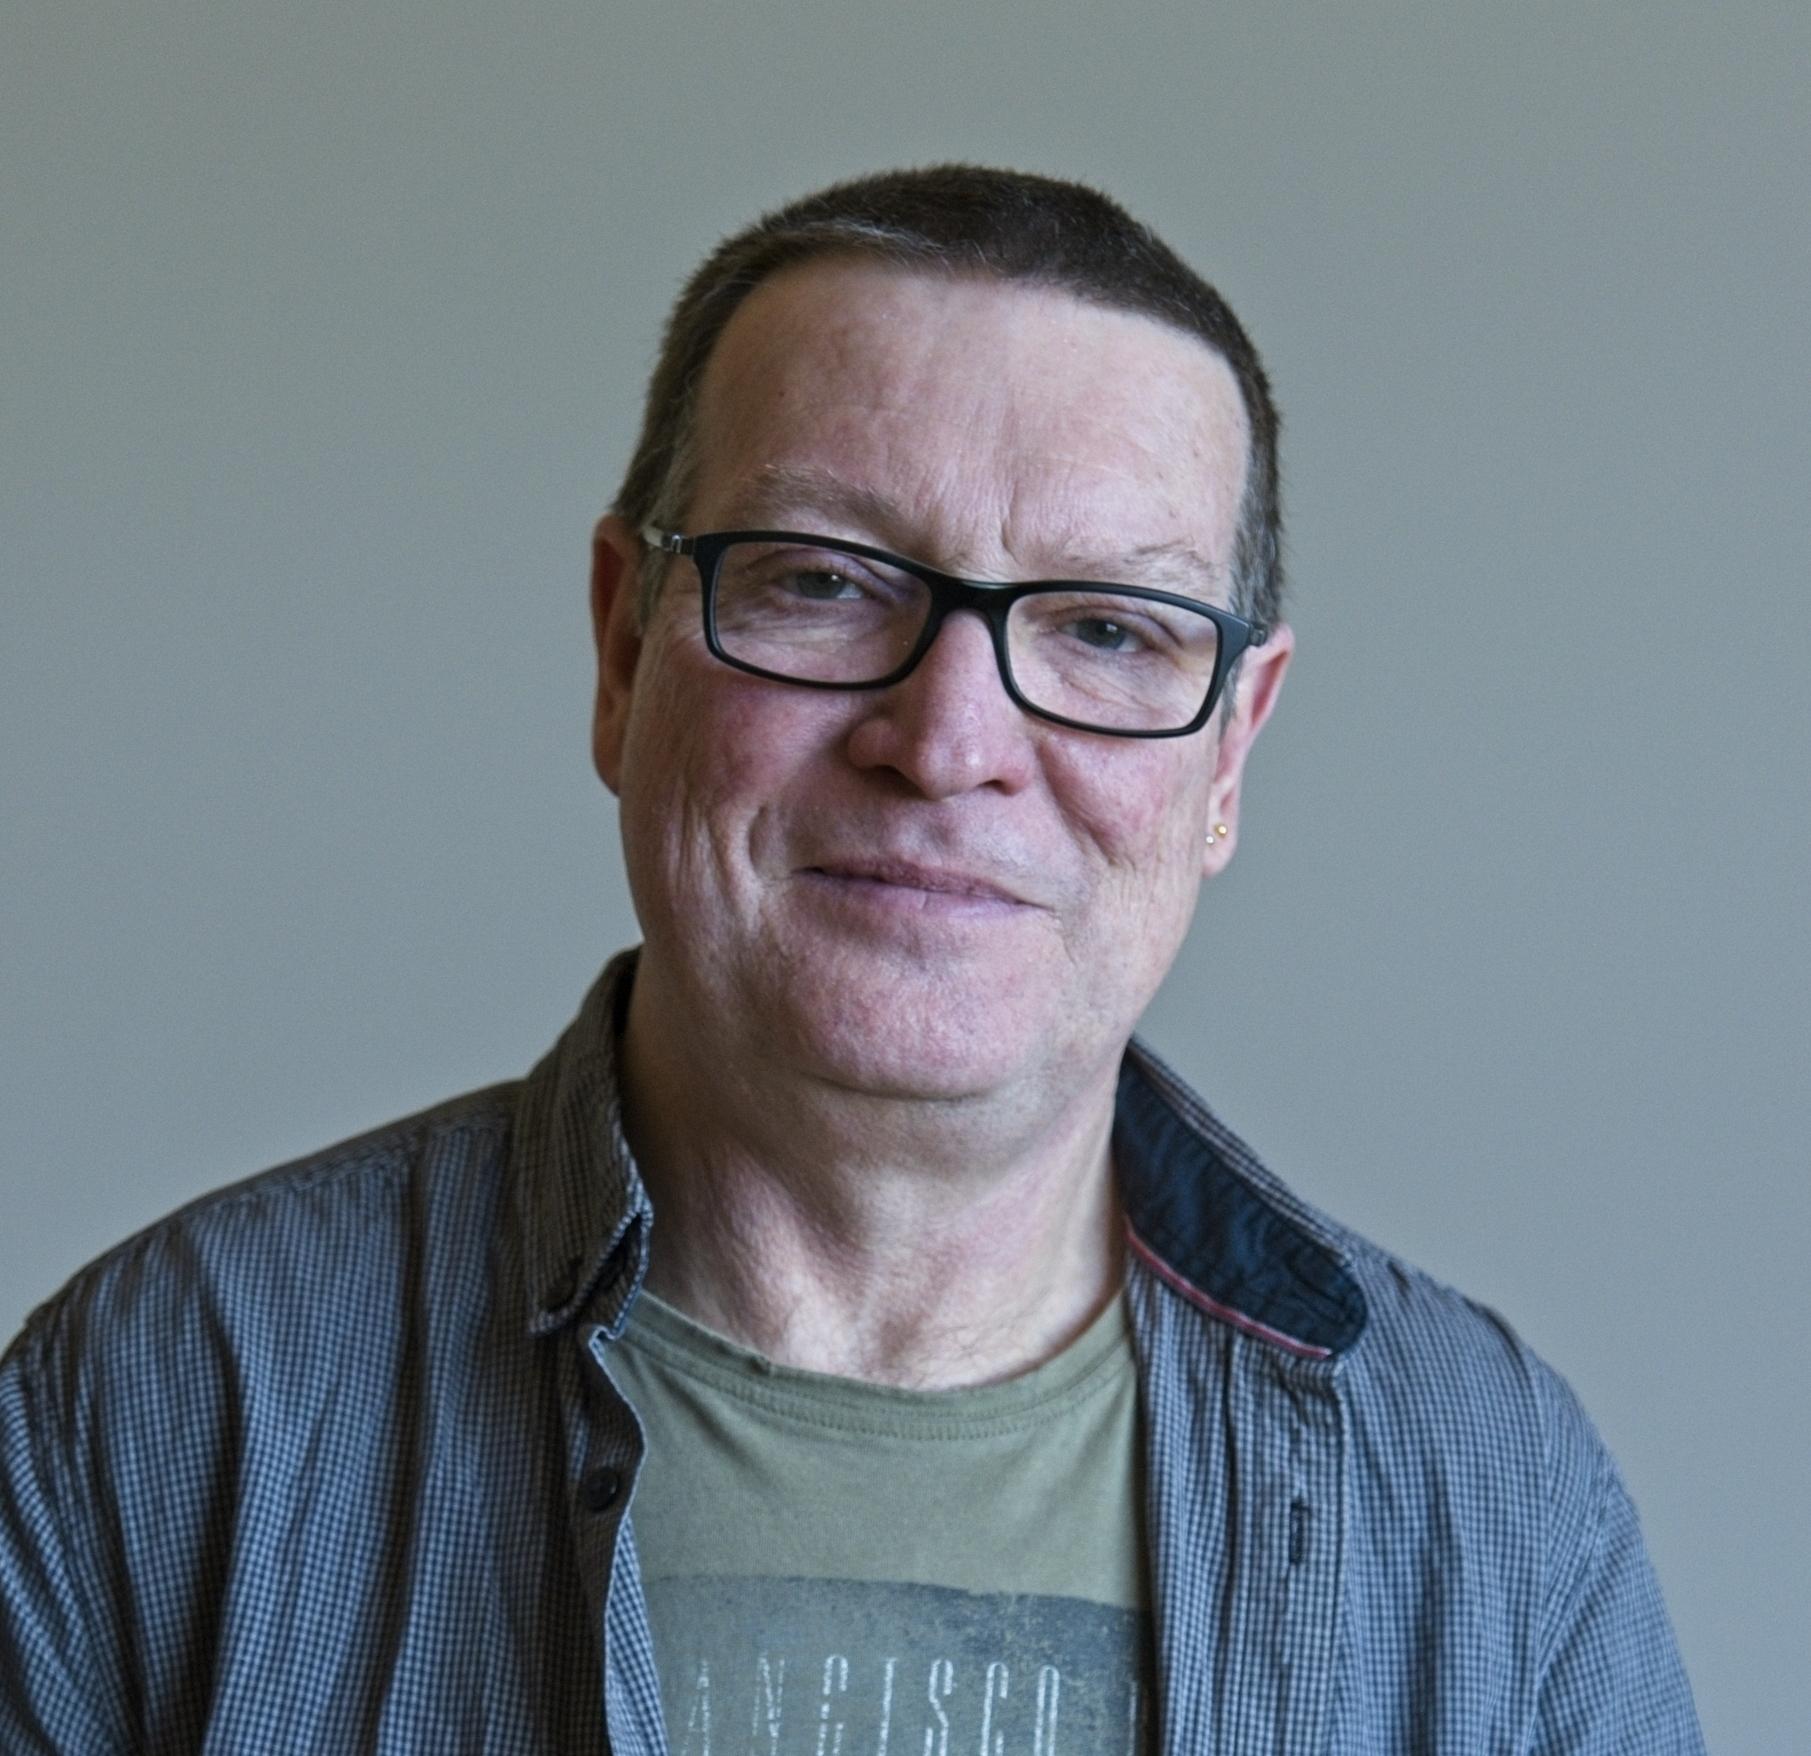 Curt Stocksiek High School Science Teacher